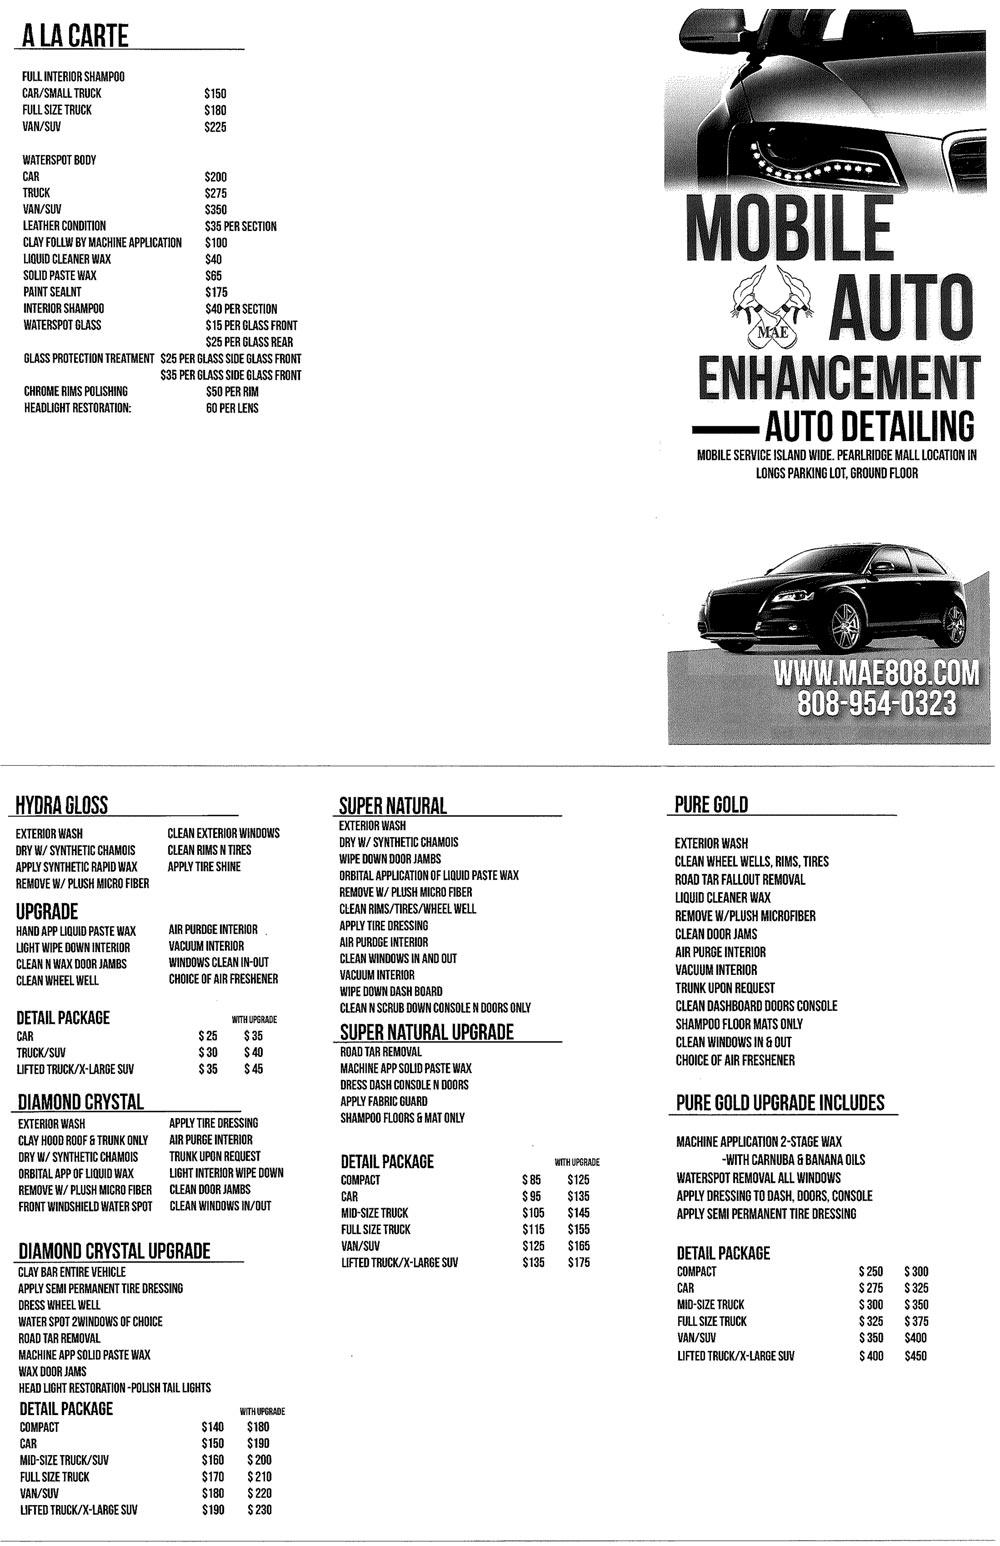 Automatic Car Wash Honolulu